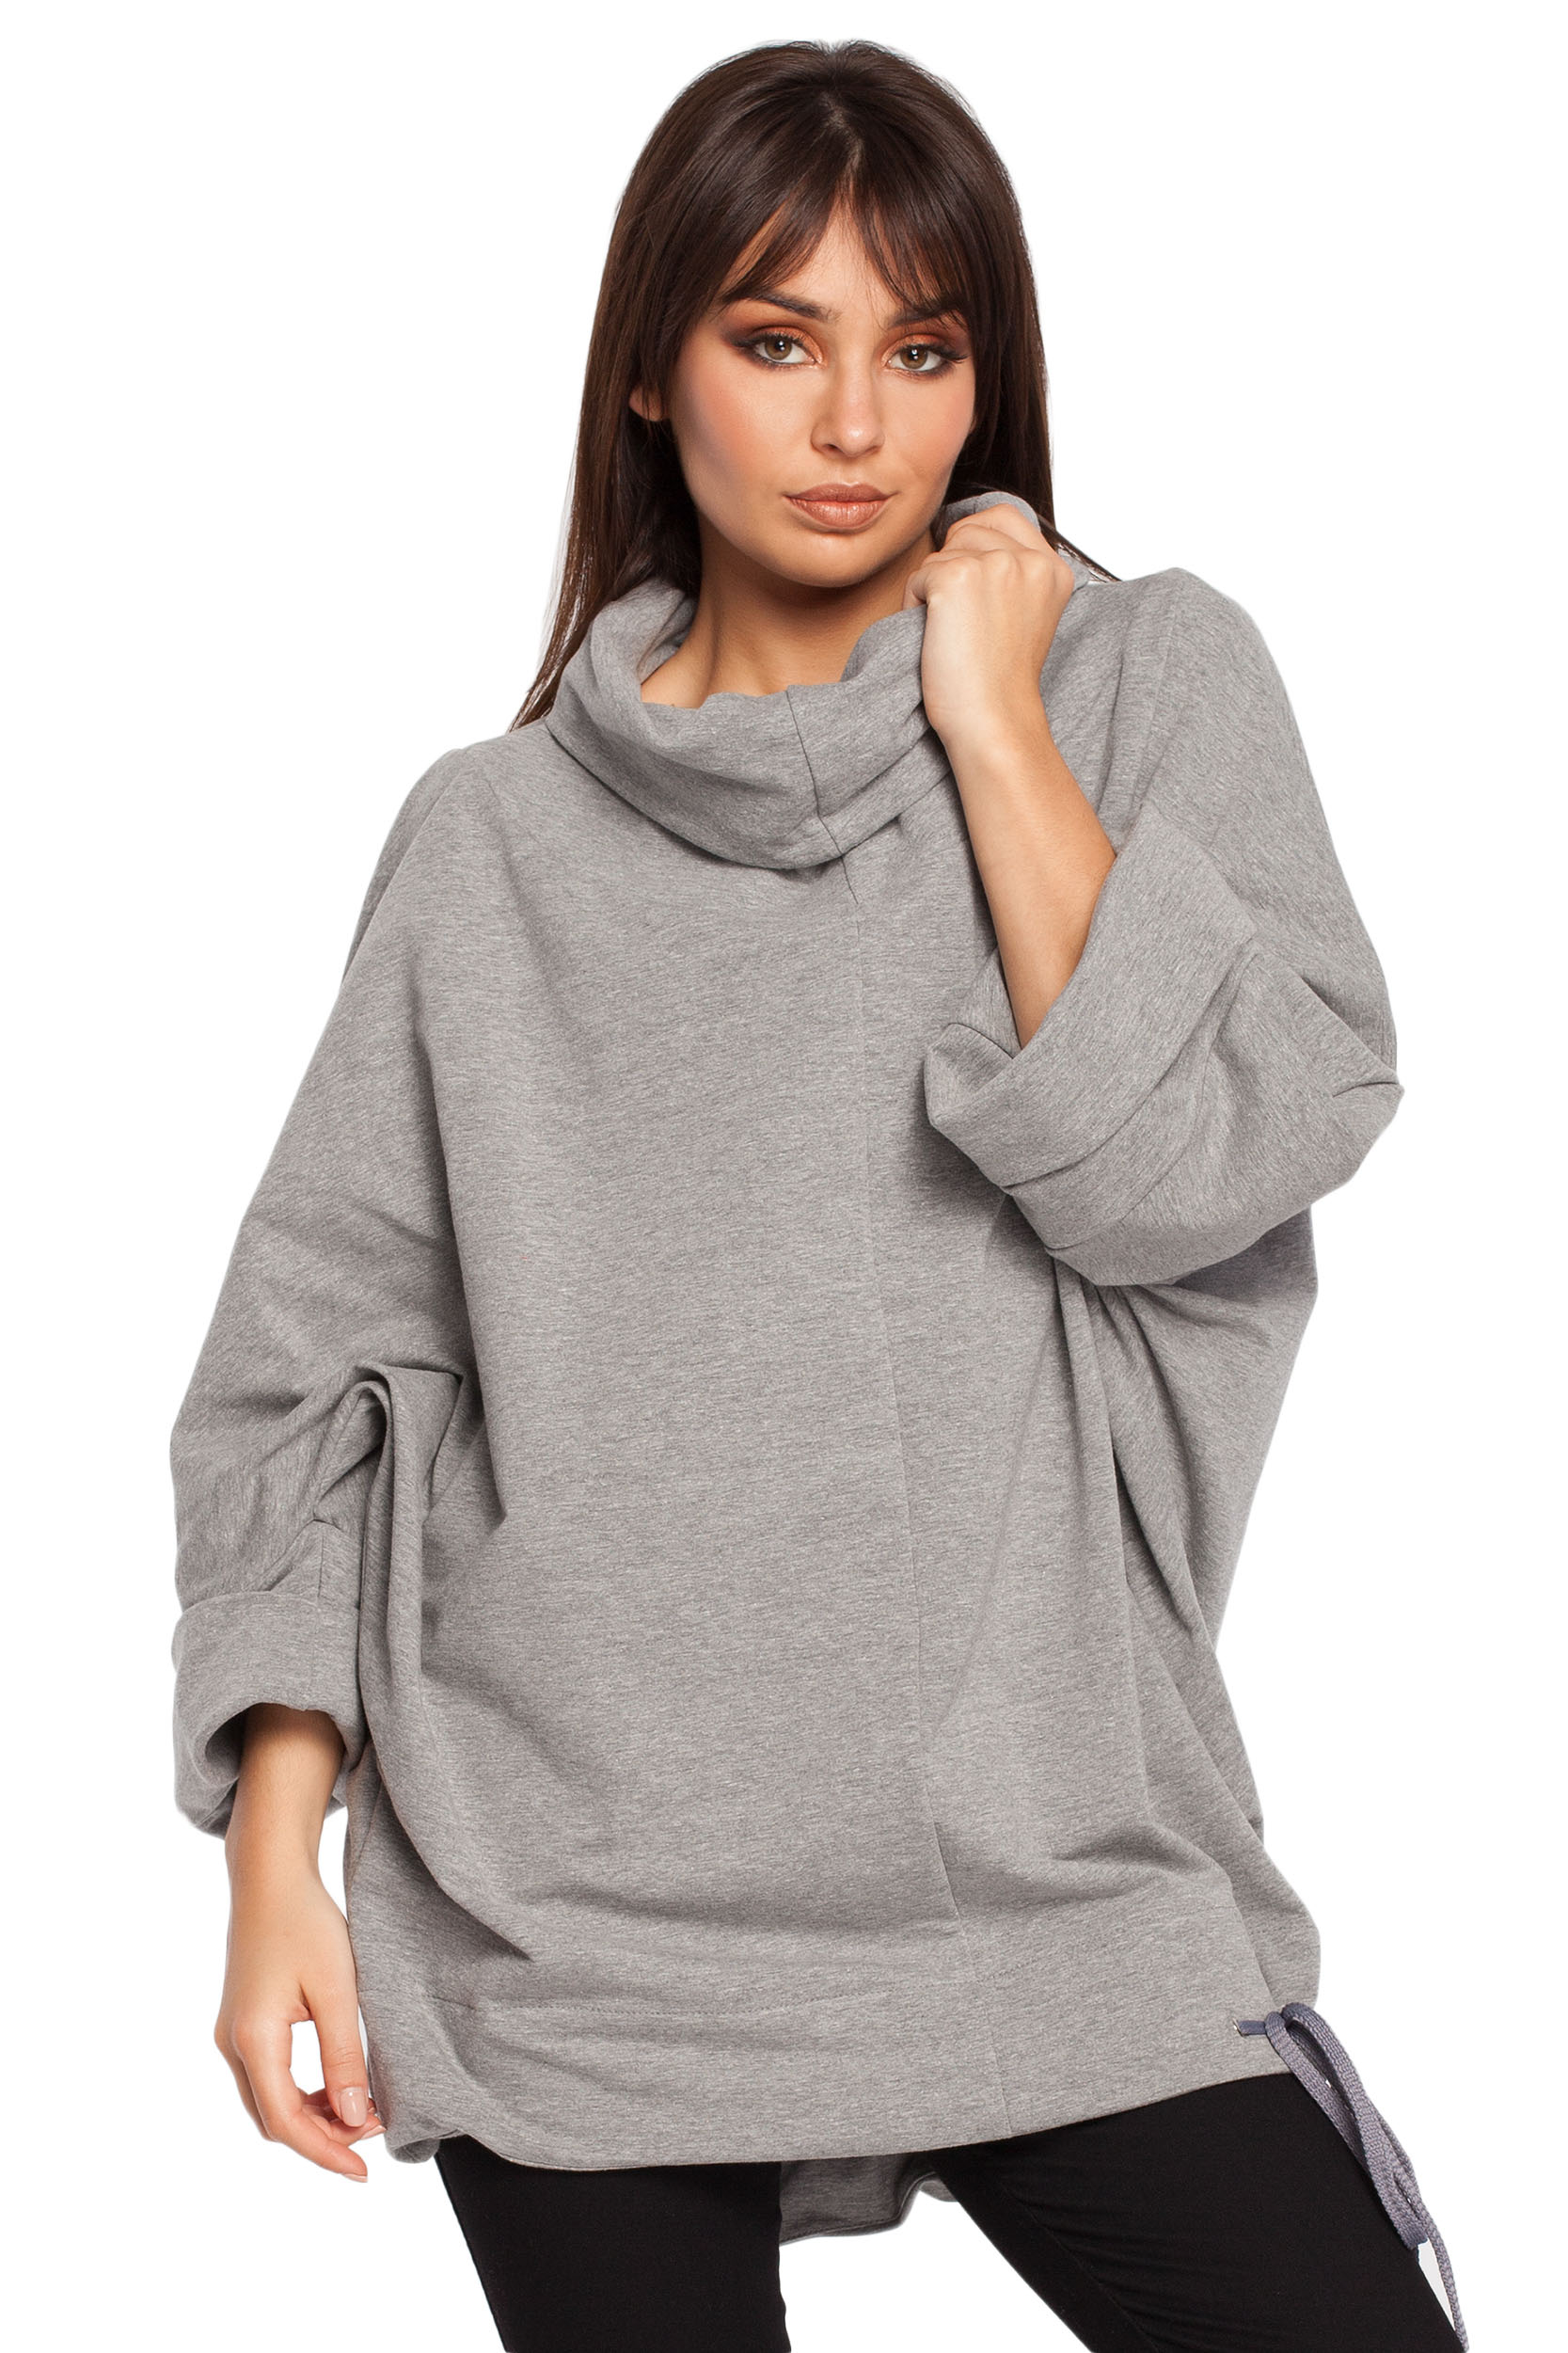 Damska bawełniana bluza oversize z kominem szara B027